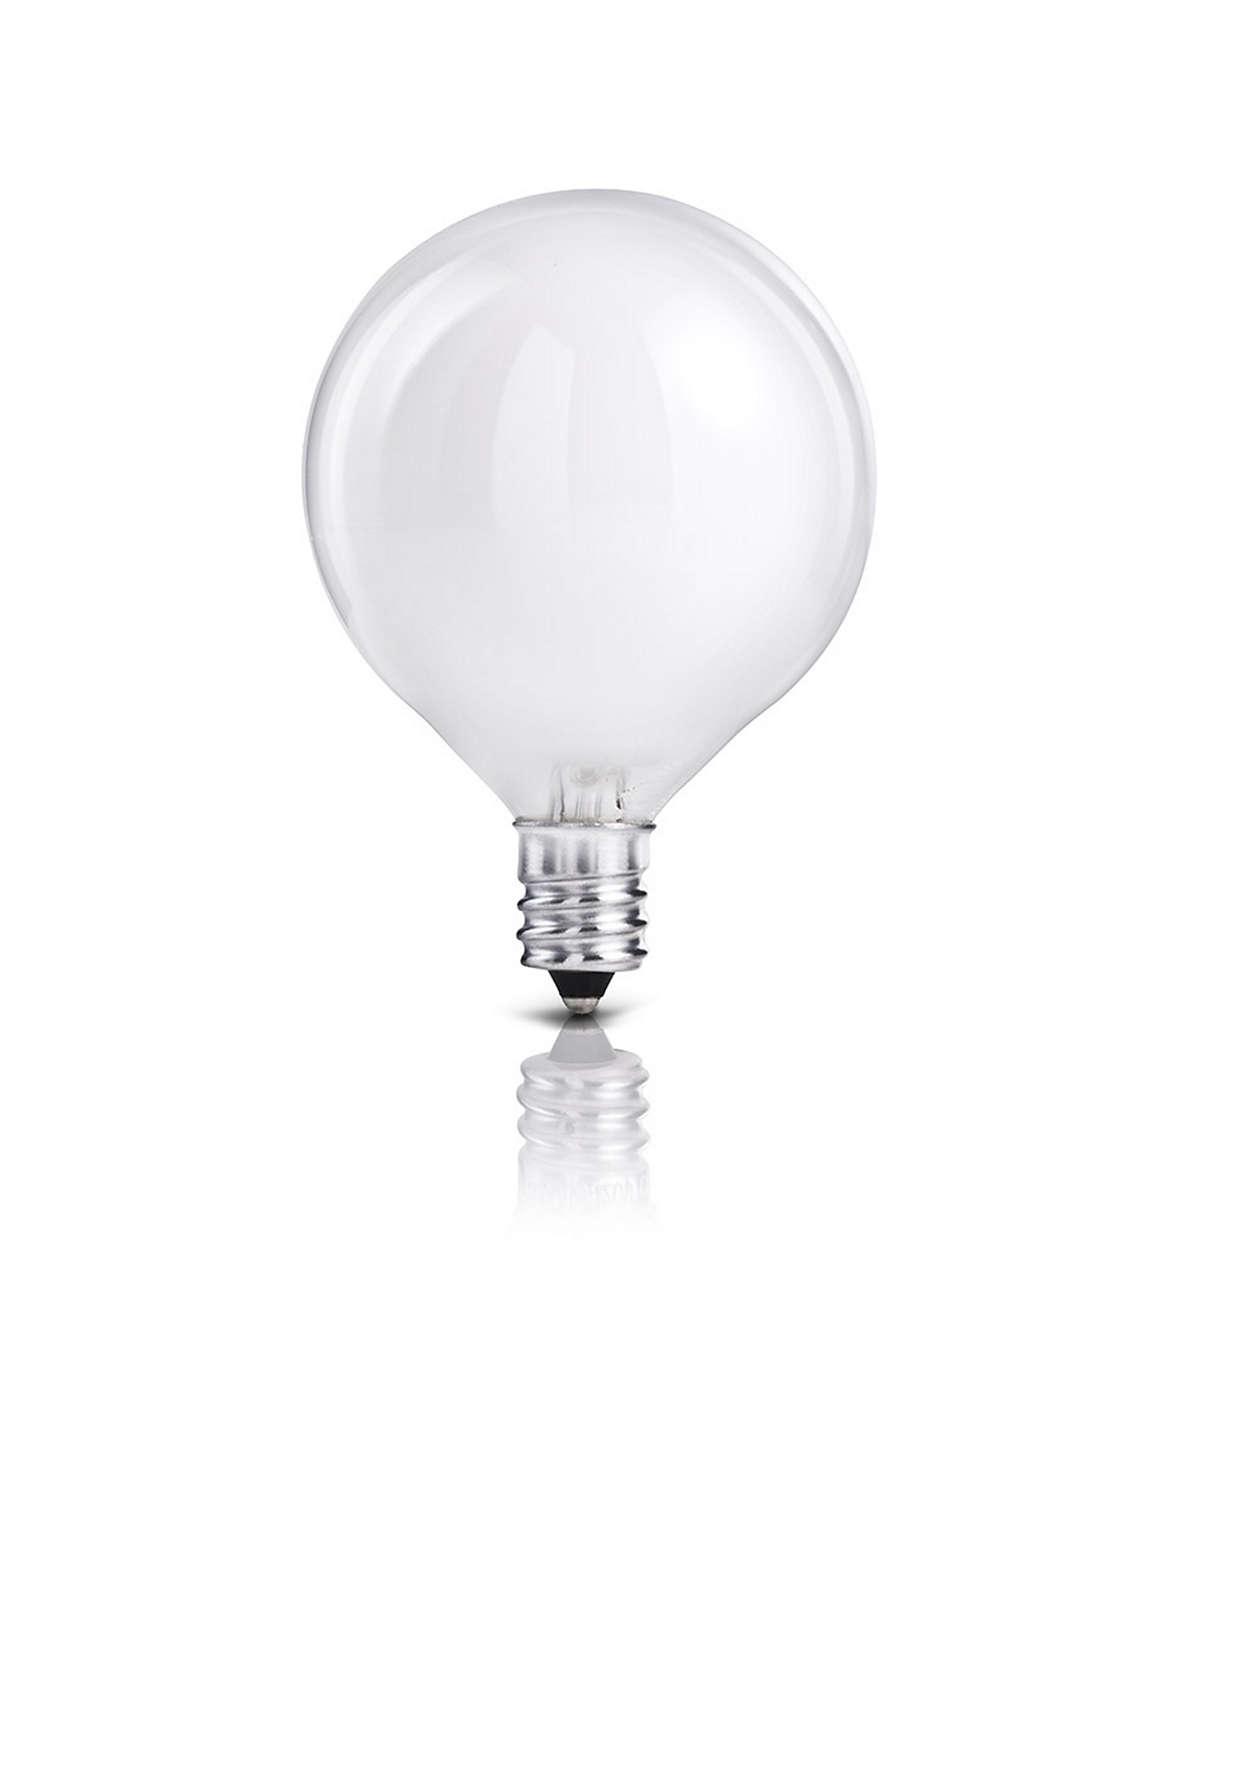 Energy savings without sacrifice